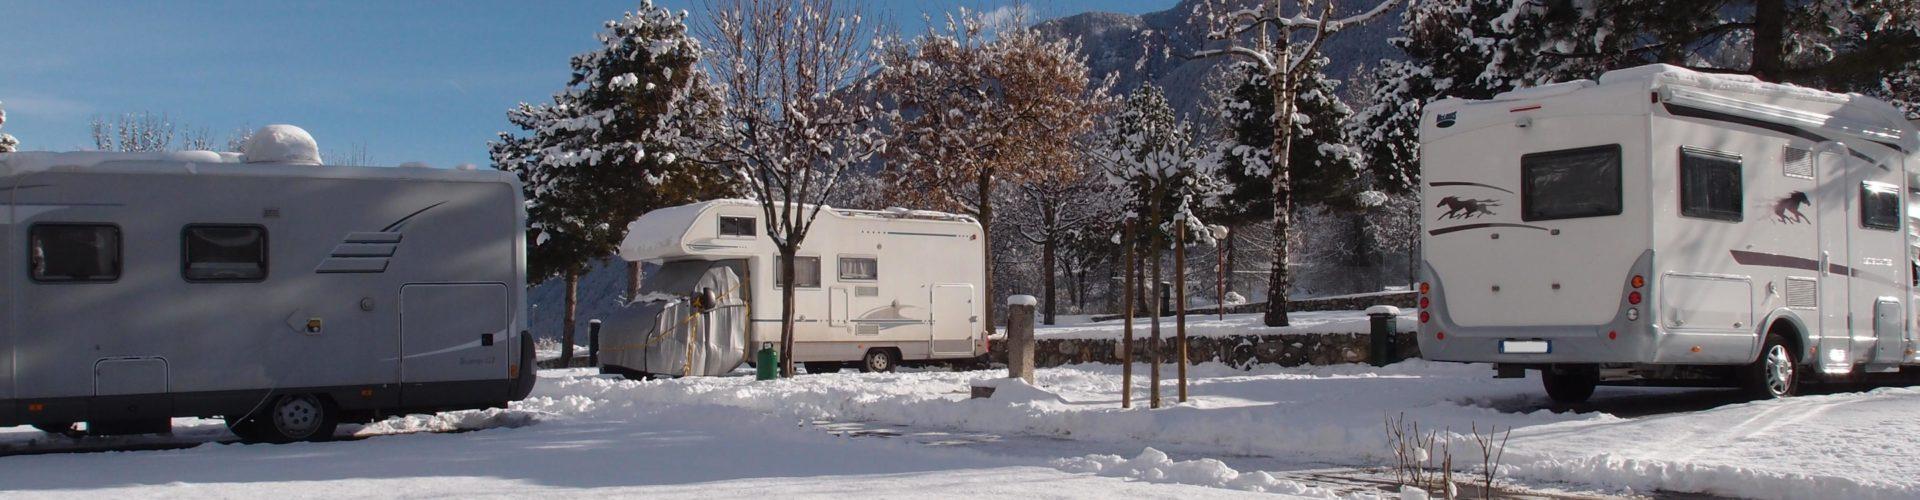 Inverno in Camper